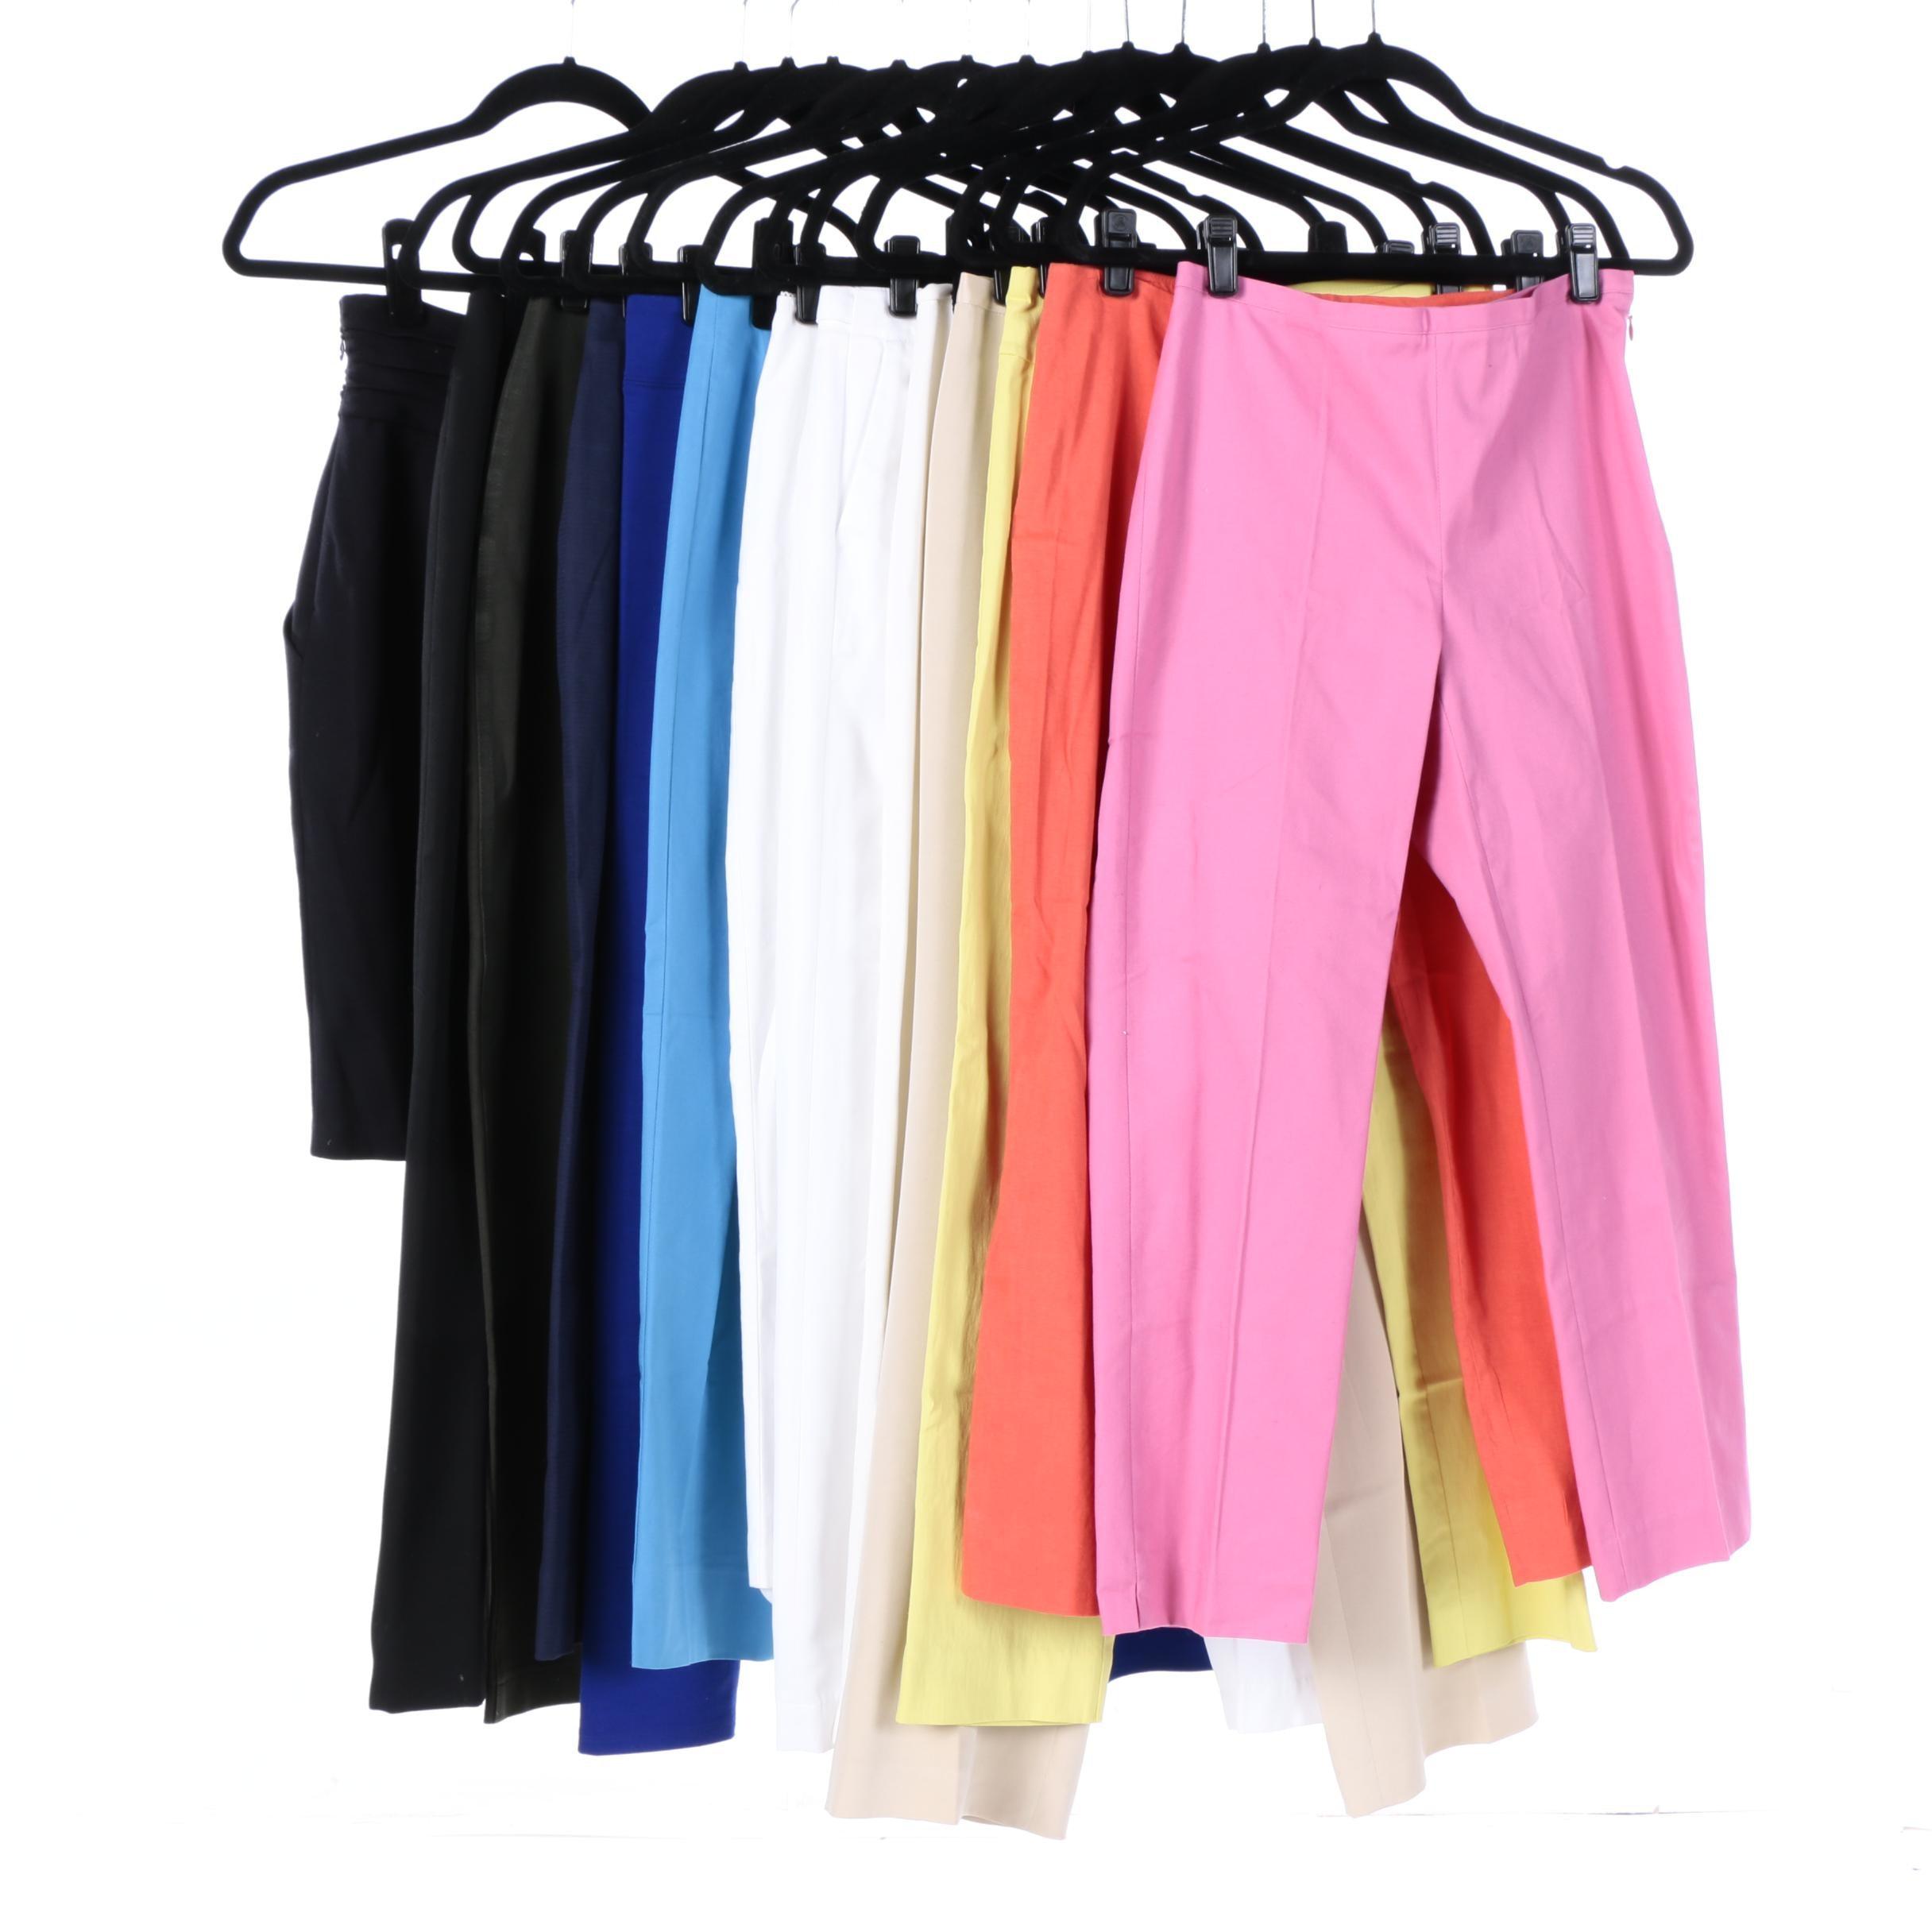 Women's Pants and Skirt Including Tahari and BCBG Max Azria